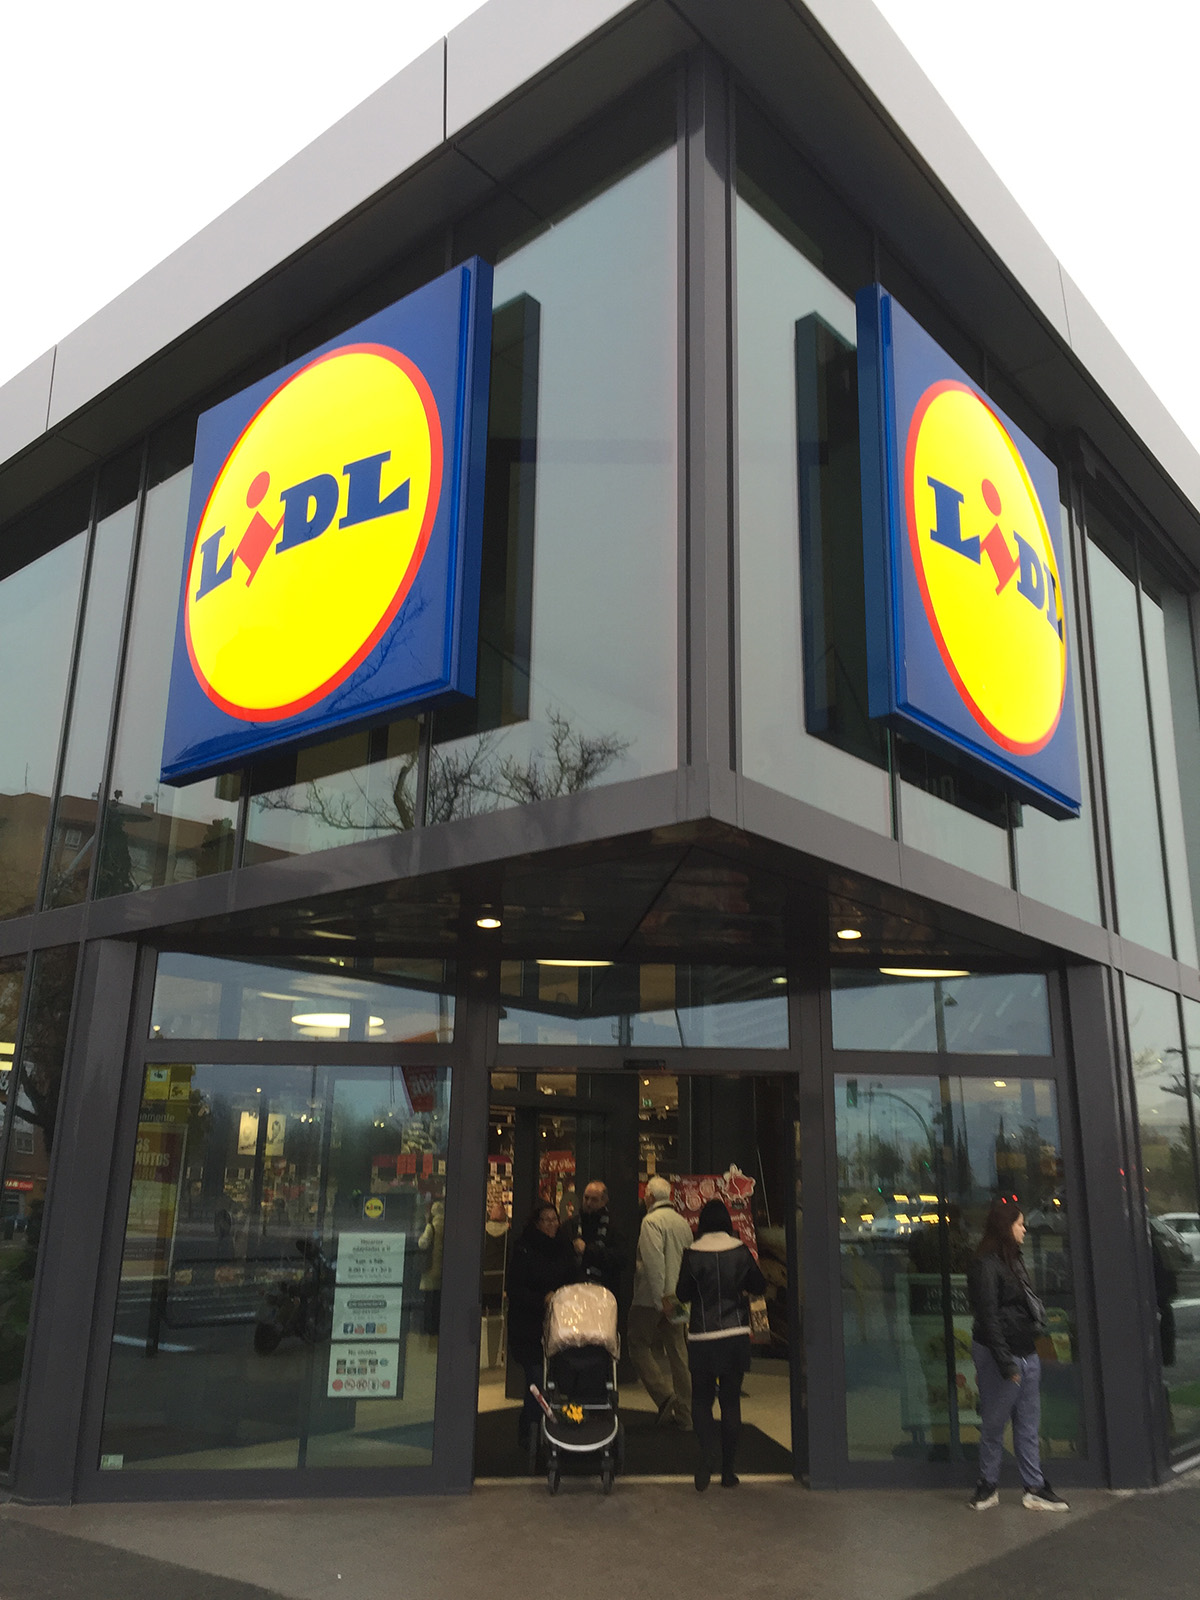 Galeria Supermercado LIDL, Almozara, Zaragoza - 5 ?>